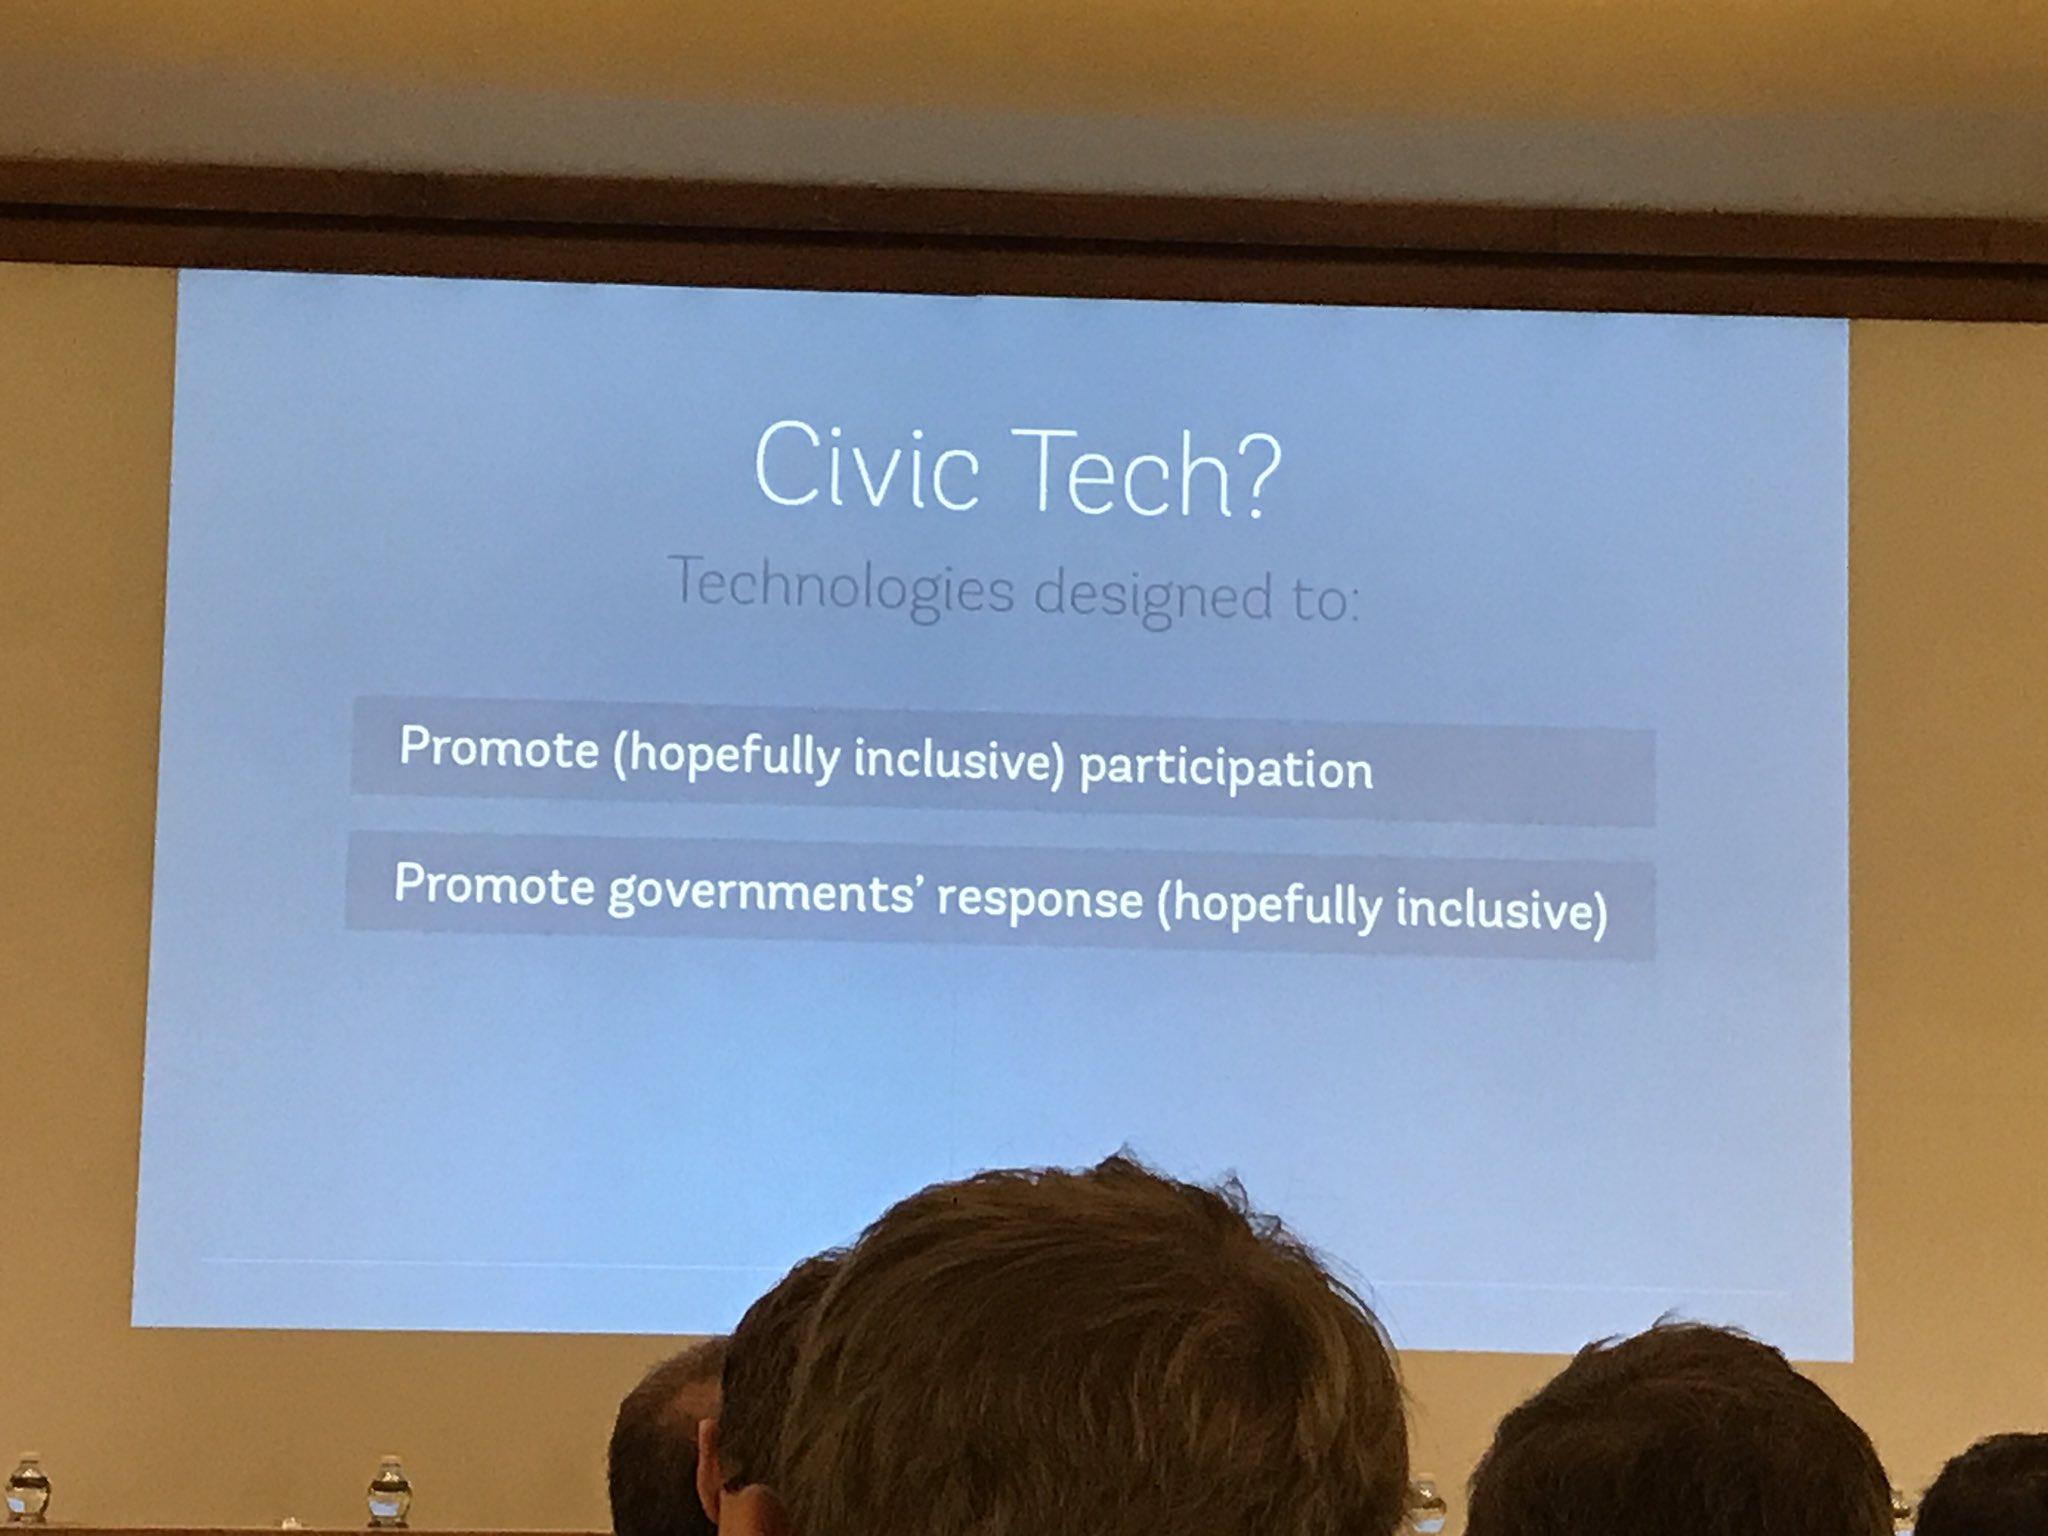 .@participatory defines #civictech as technologies designed to: - promote participation  - promote governments' response #tictec https://t.co/8PpsuHPjs4